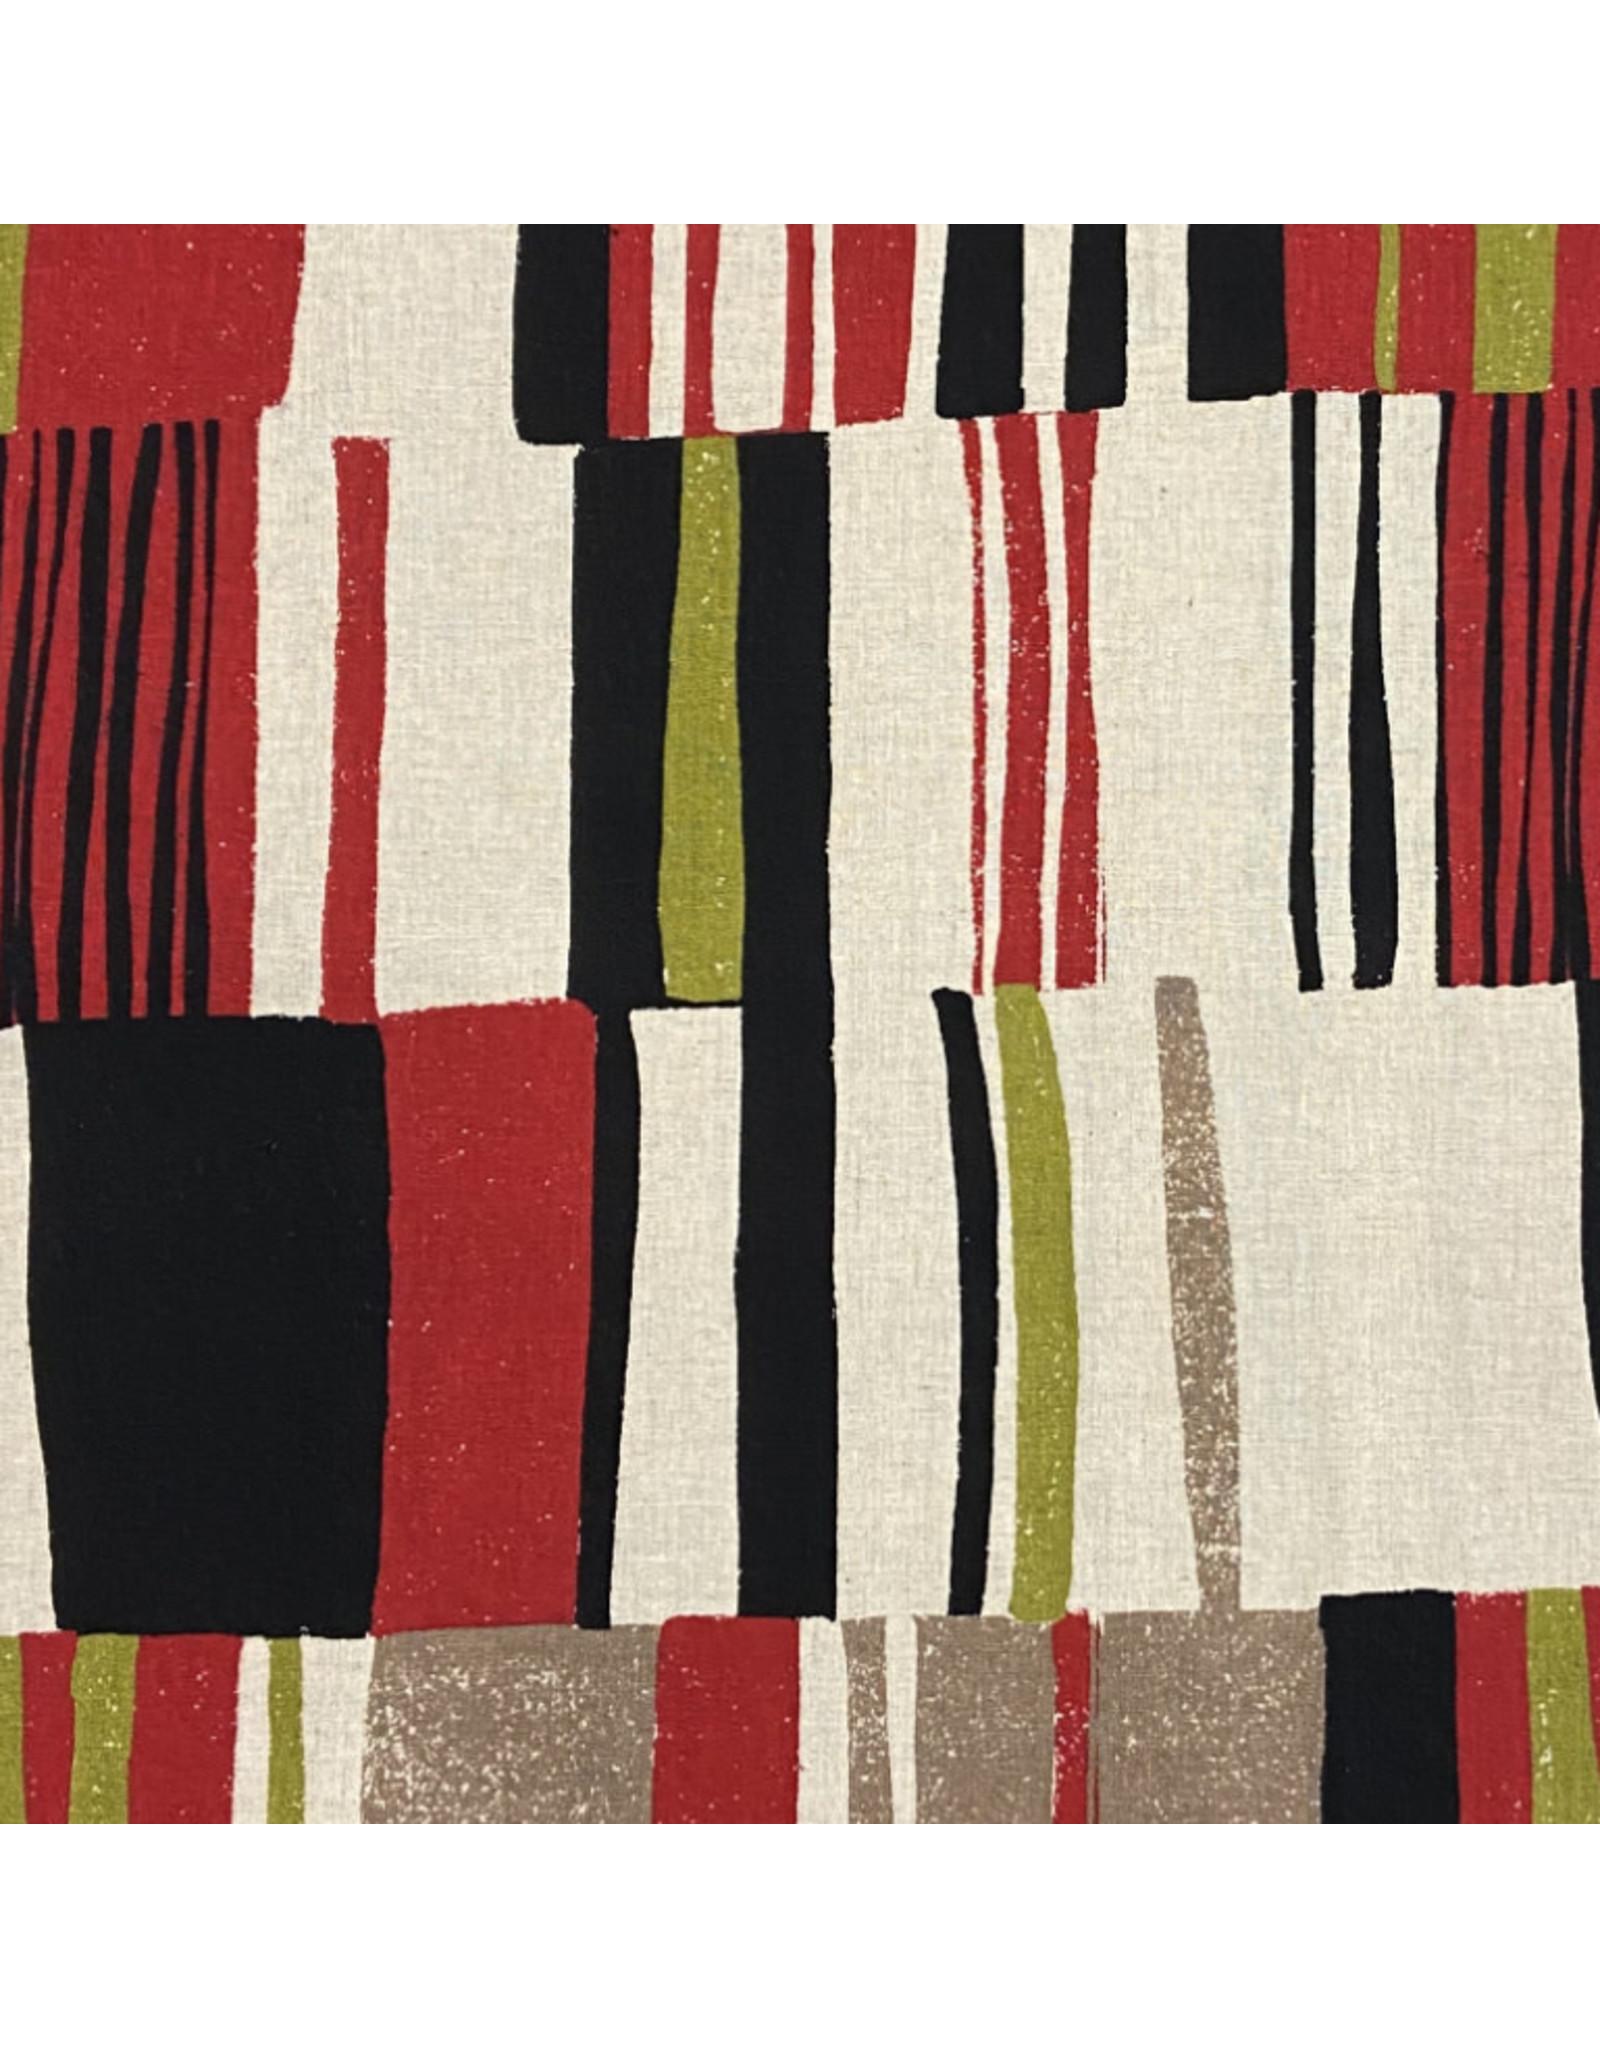 Japan Import Rayon/Linen Blend, Bold Stripes in Brick, Fabric Half-Yards, Japan Import